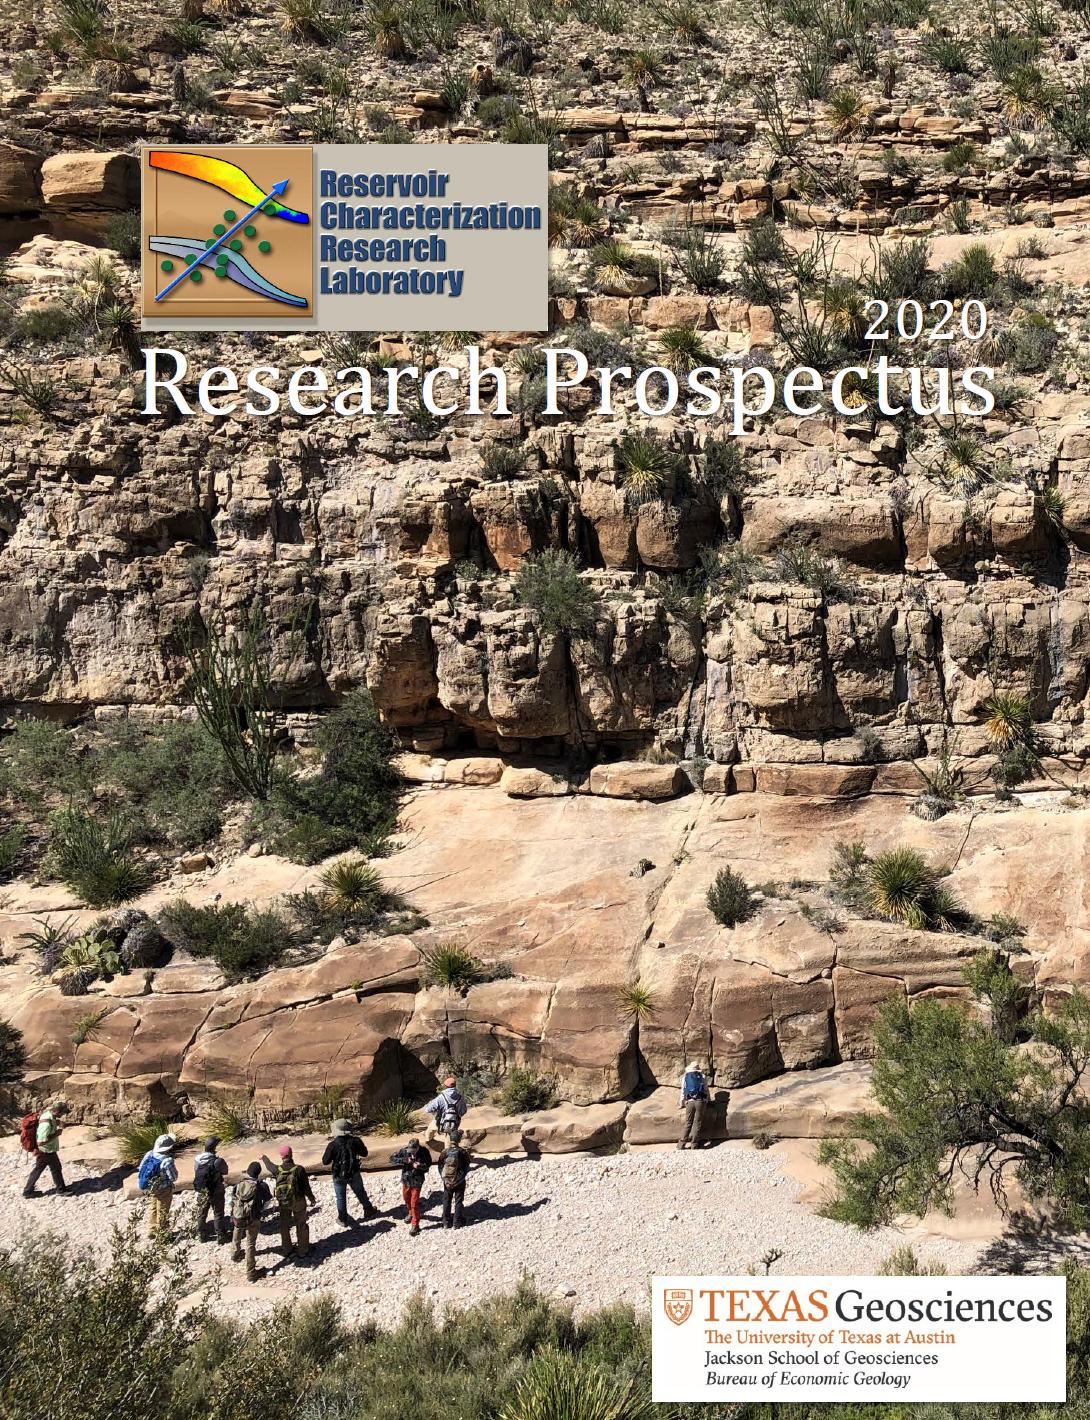 2020 Executive Summary and Prospectus